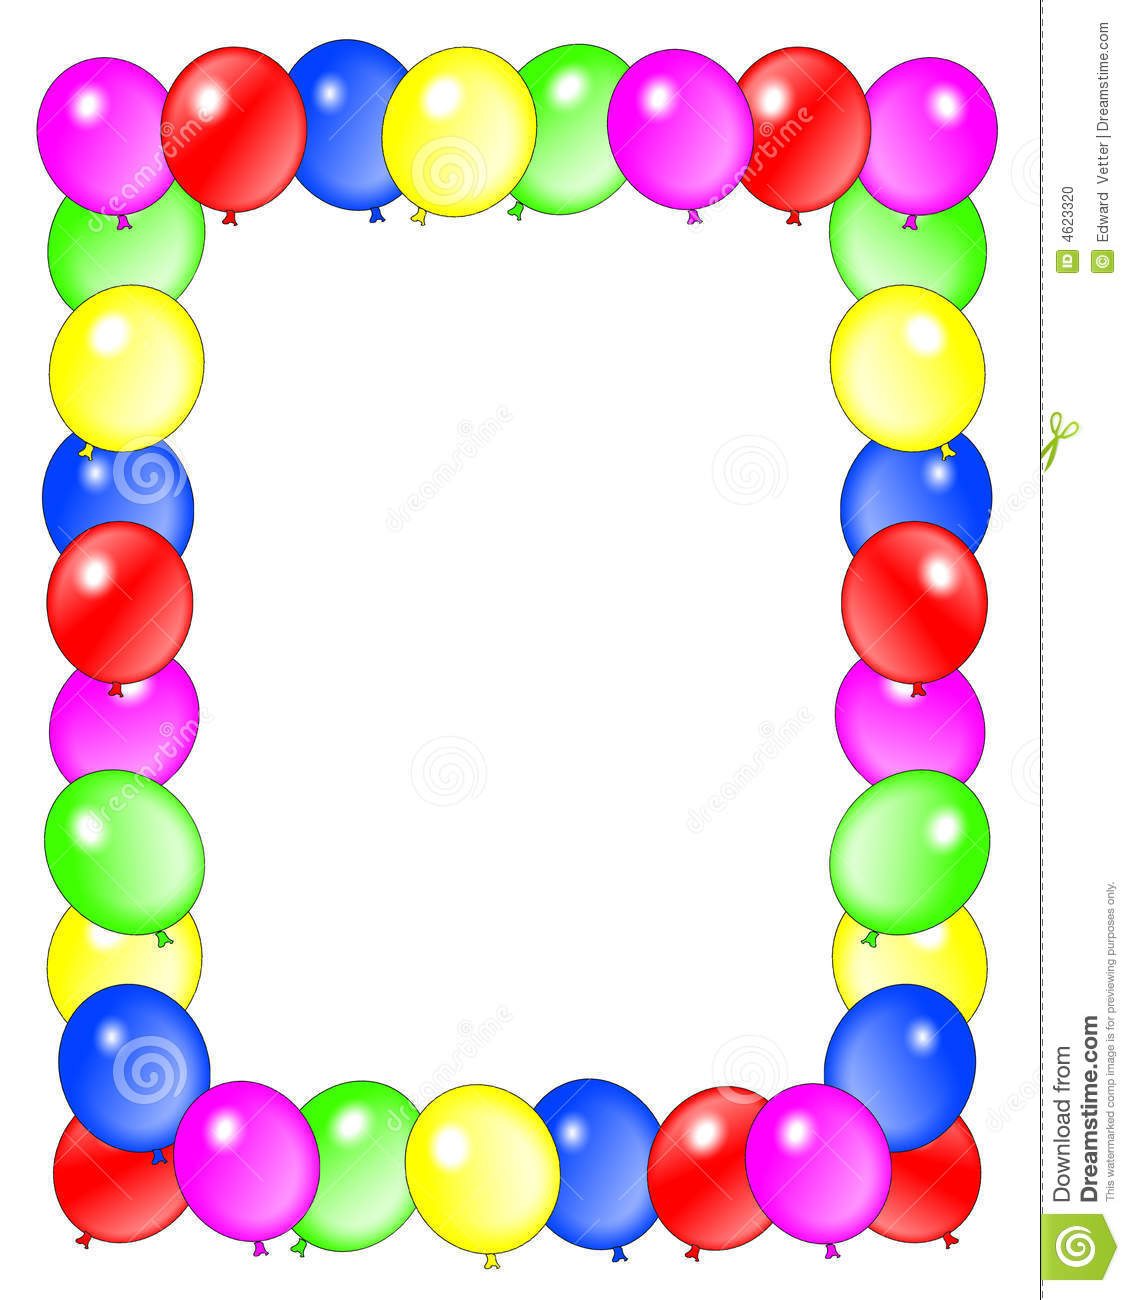 birthday-clip-art-borders-birthday-balloons-border-frame-